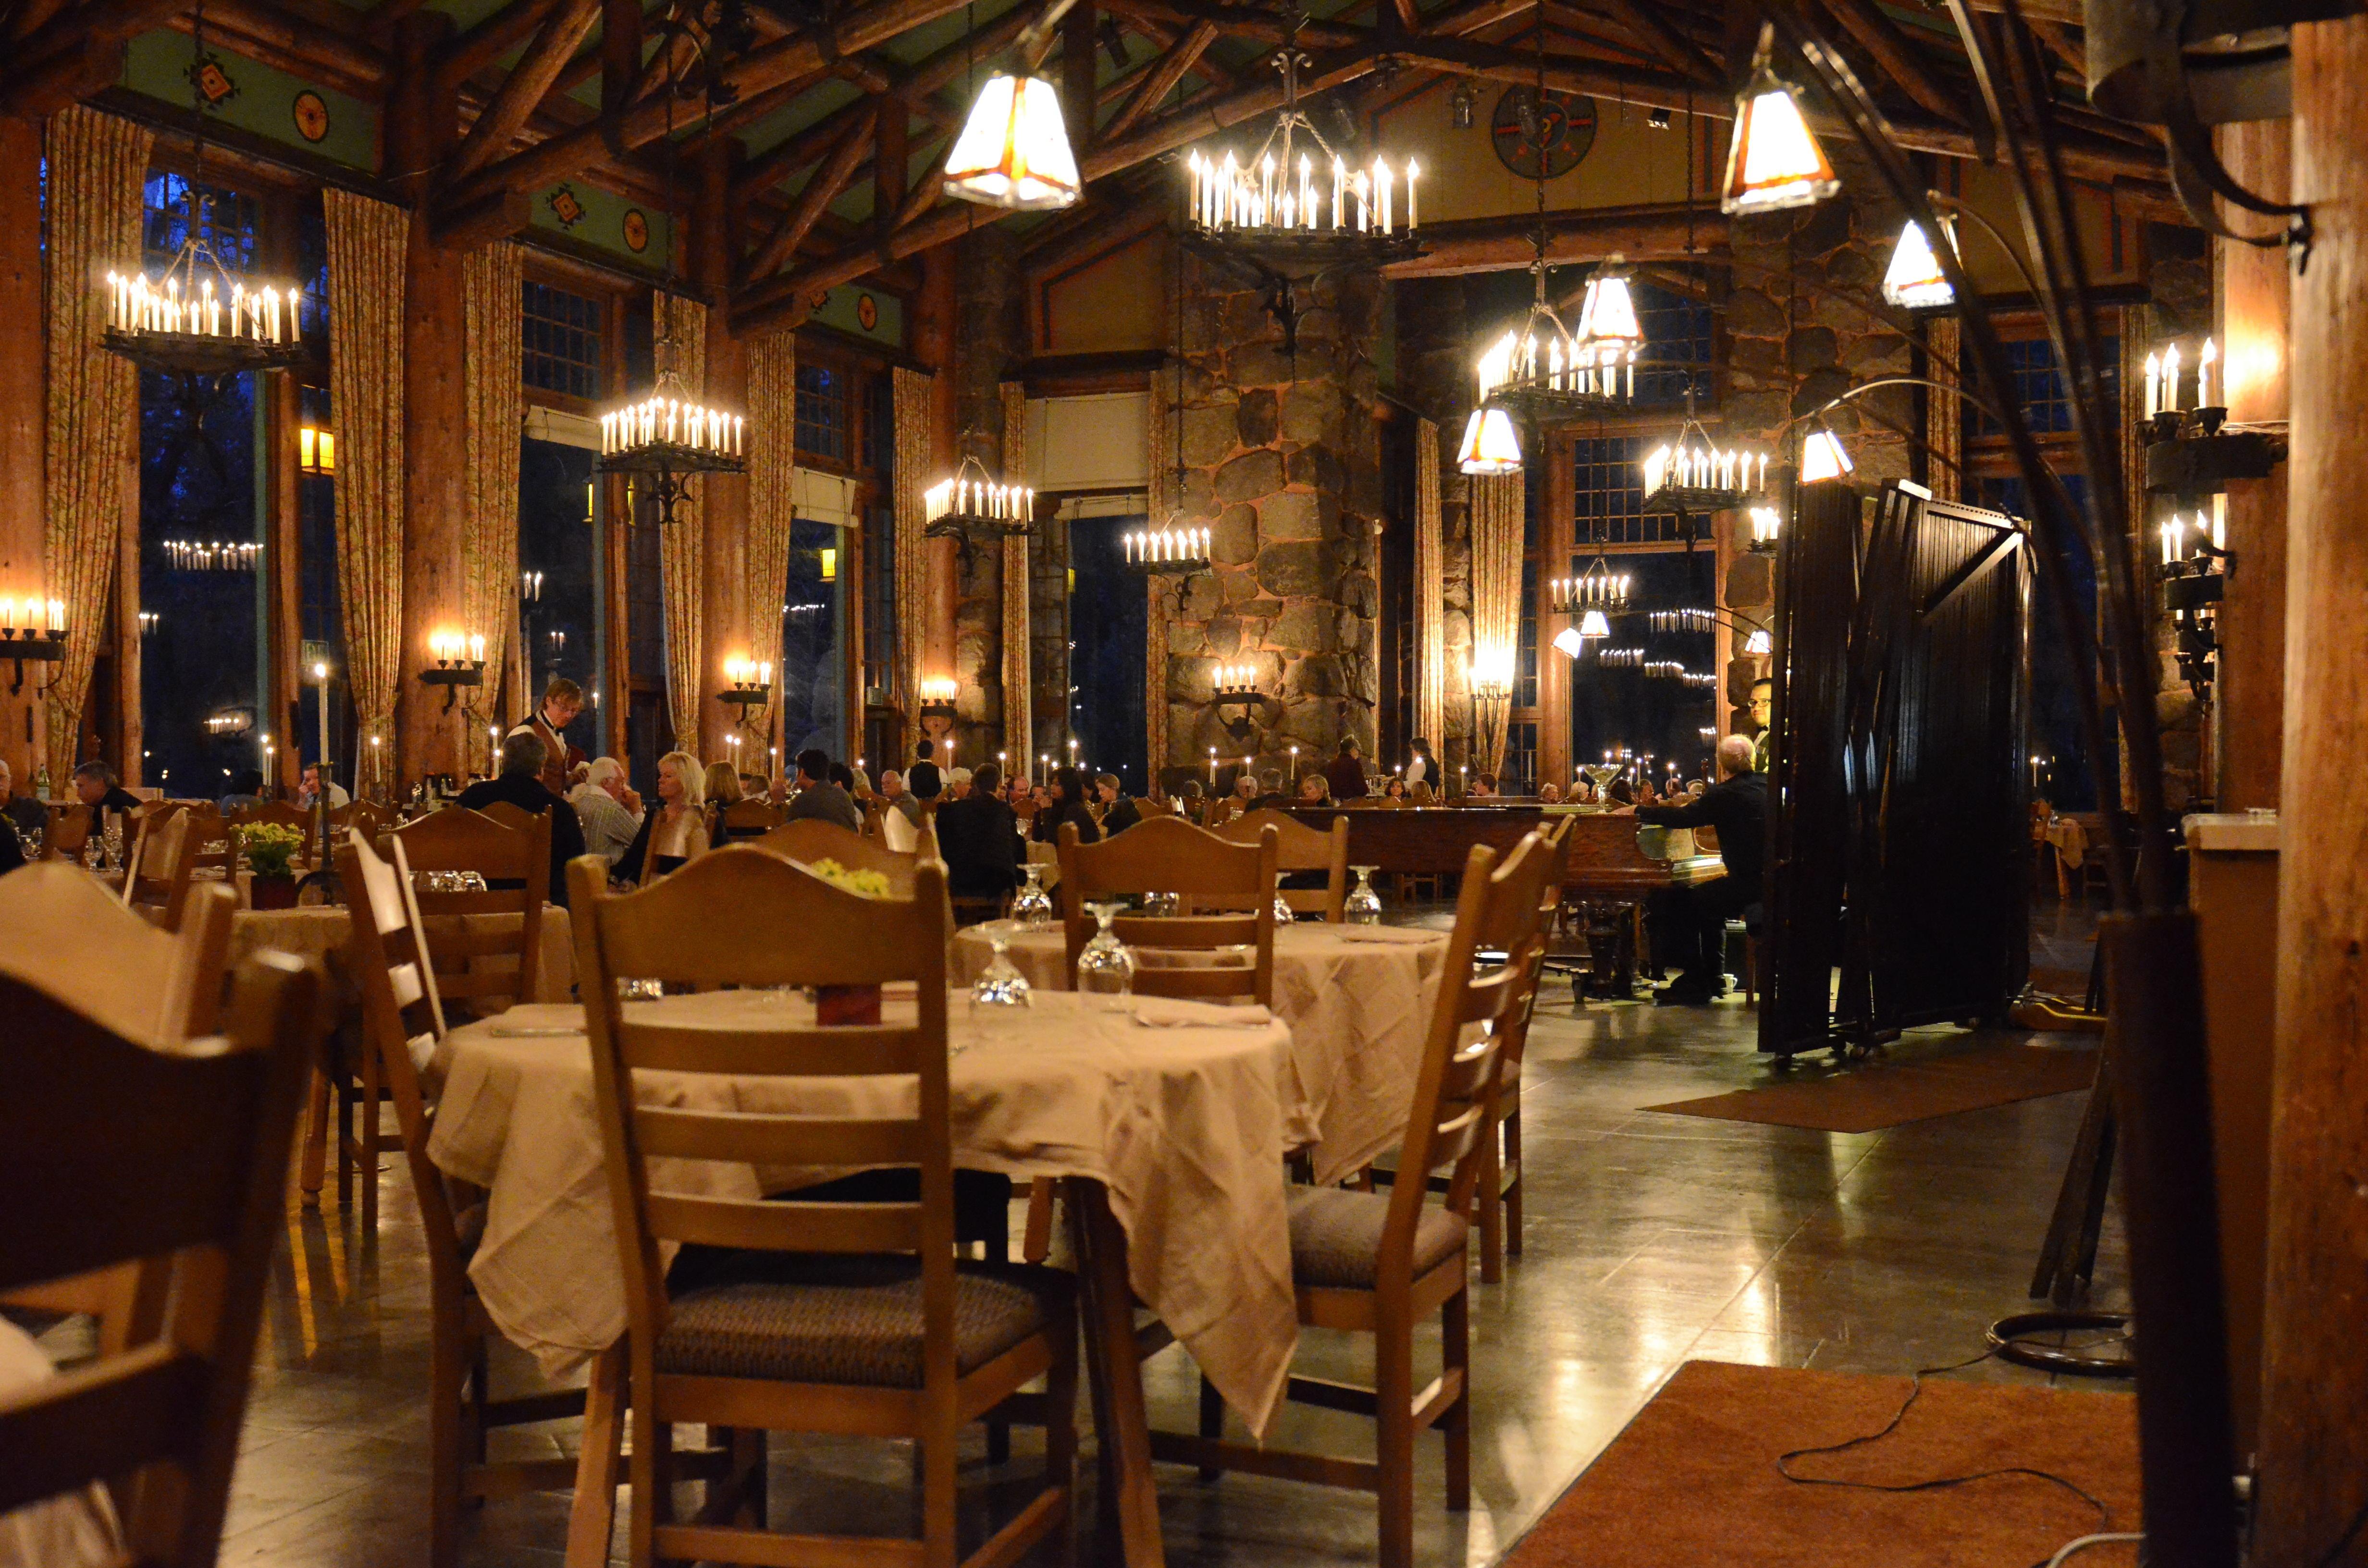 Free Images Night Restaurant Bar Food Interior